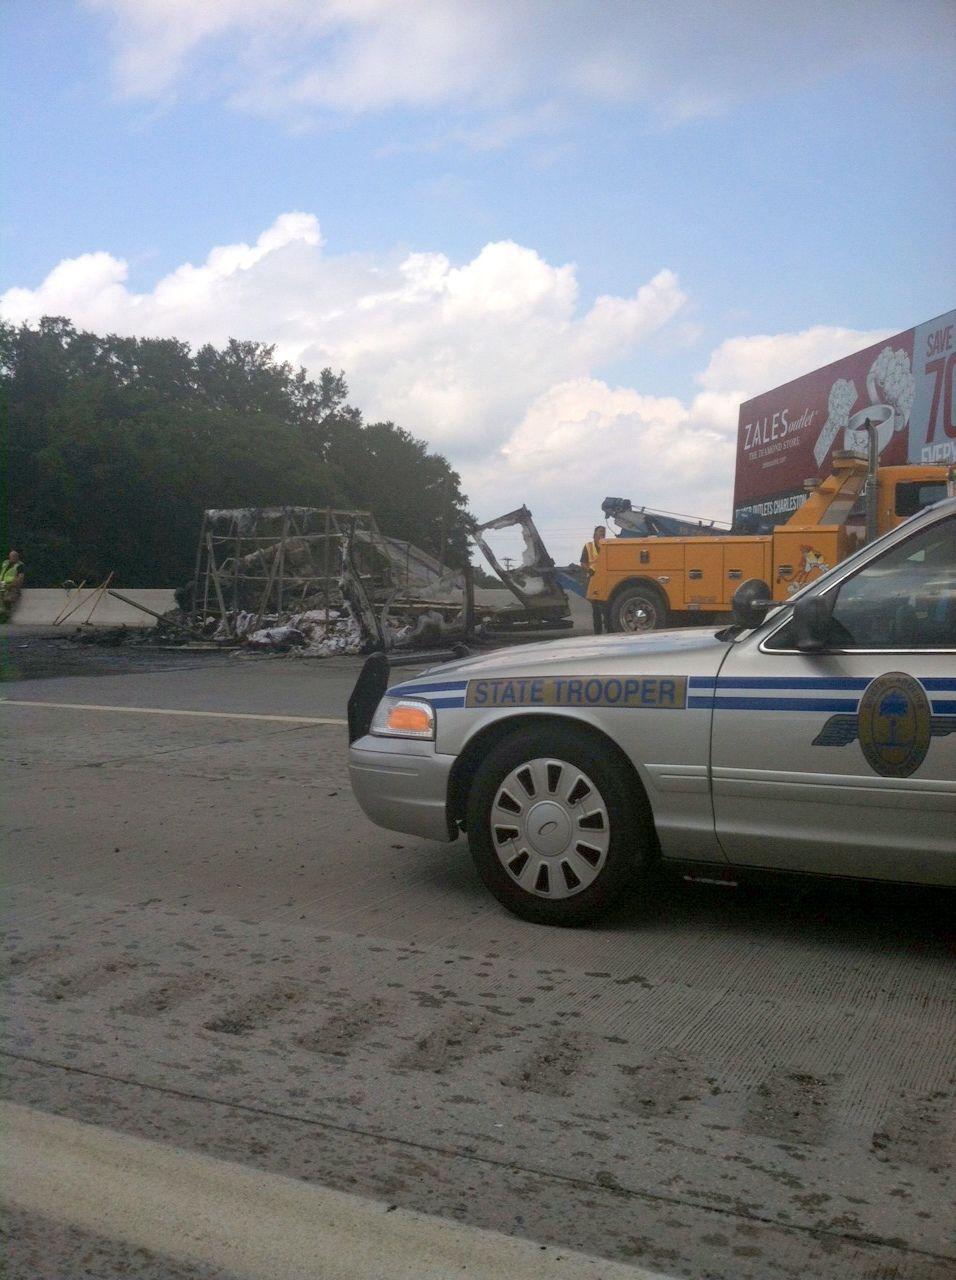 Burning van on interstate draws attention